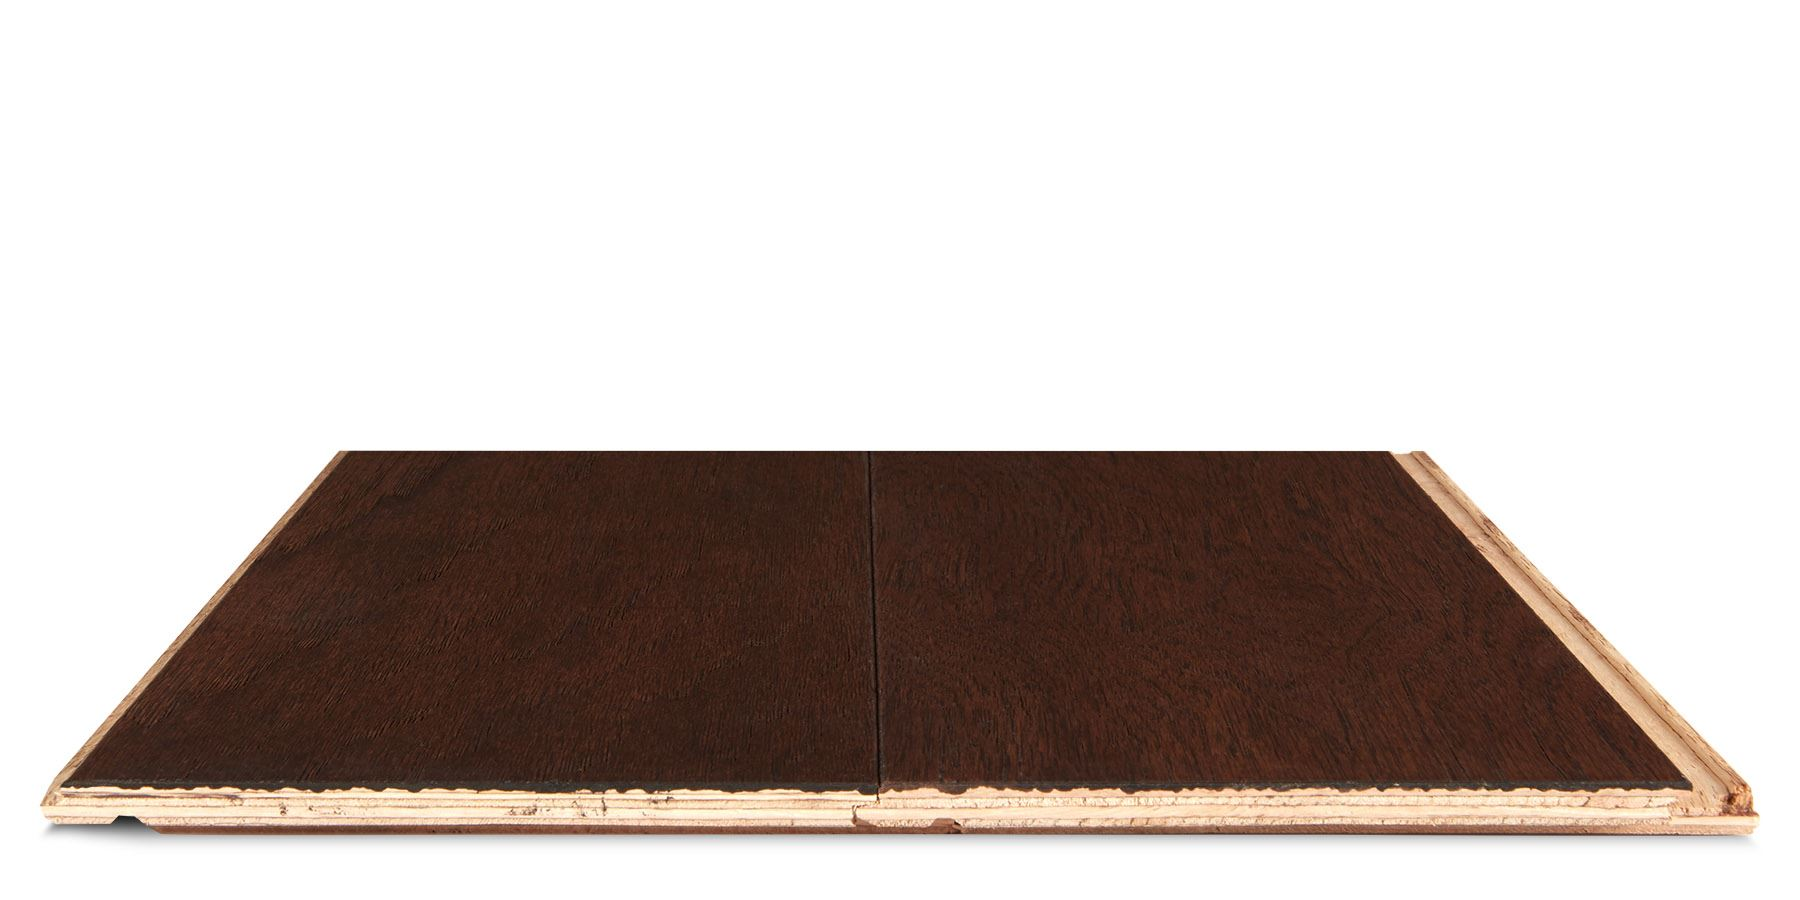 Calloway Engineered Hardwood Flooring